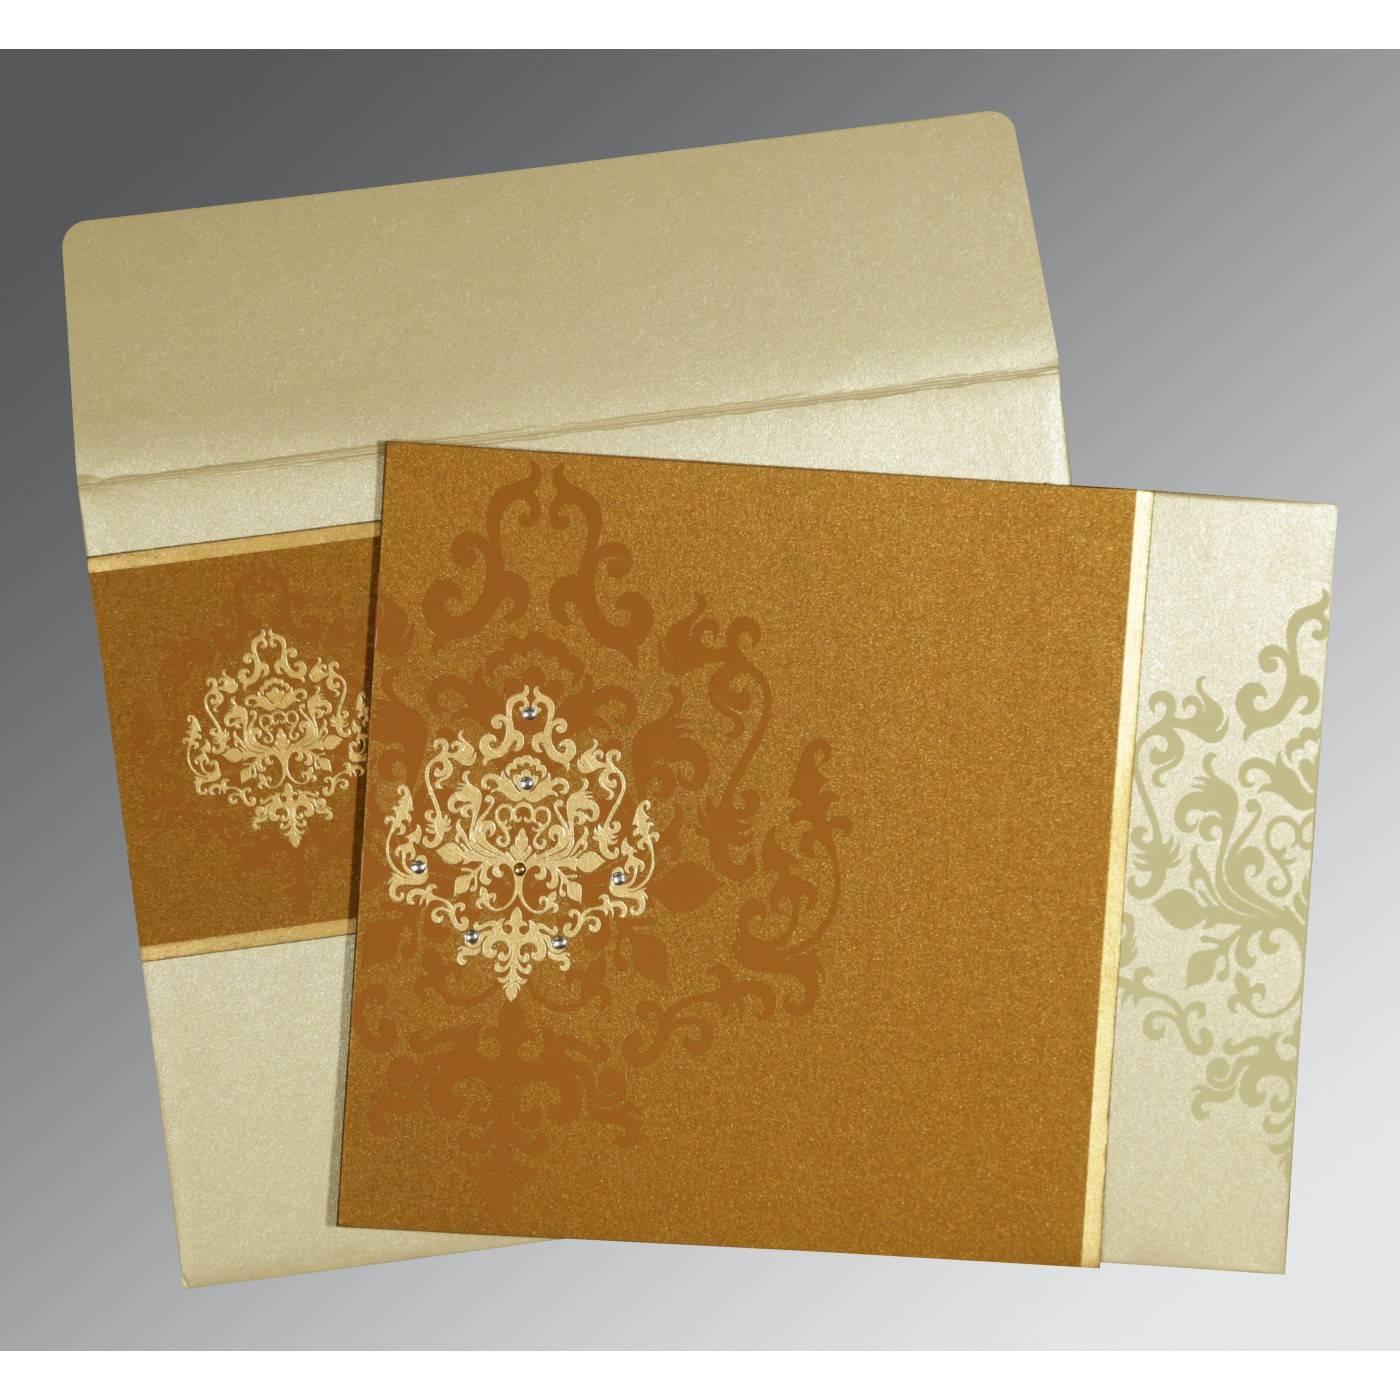 MUSTARD YELLOW SHIMMERY DAMASK THEMED - SCREEN PRINTED WEDDING CARD : CRU-8253G - IndianWeddingCards